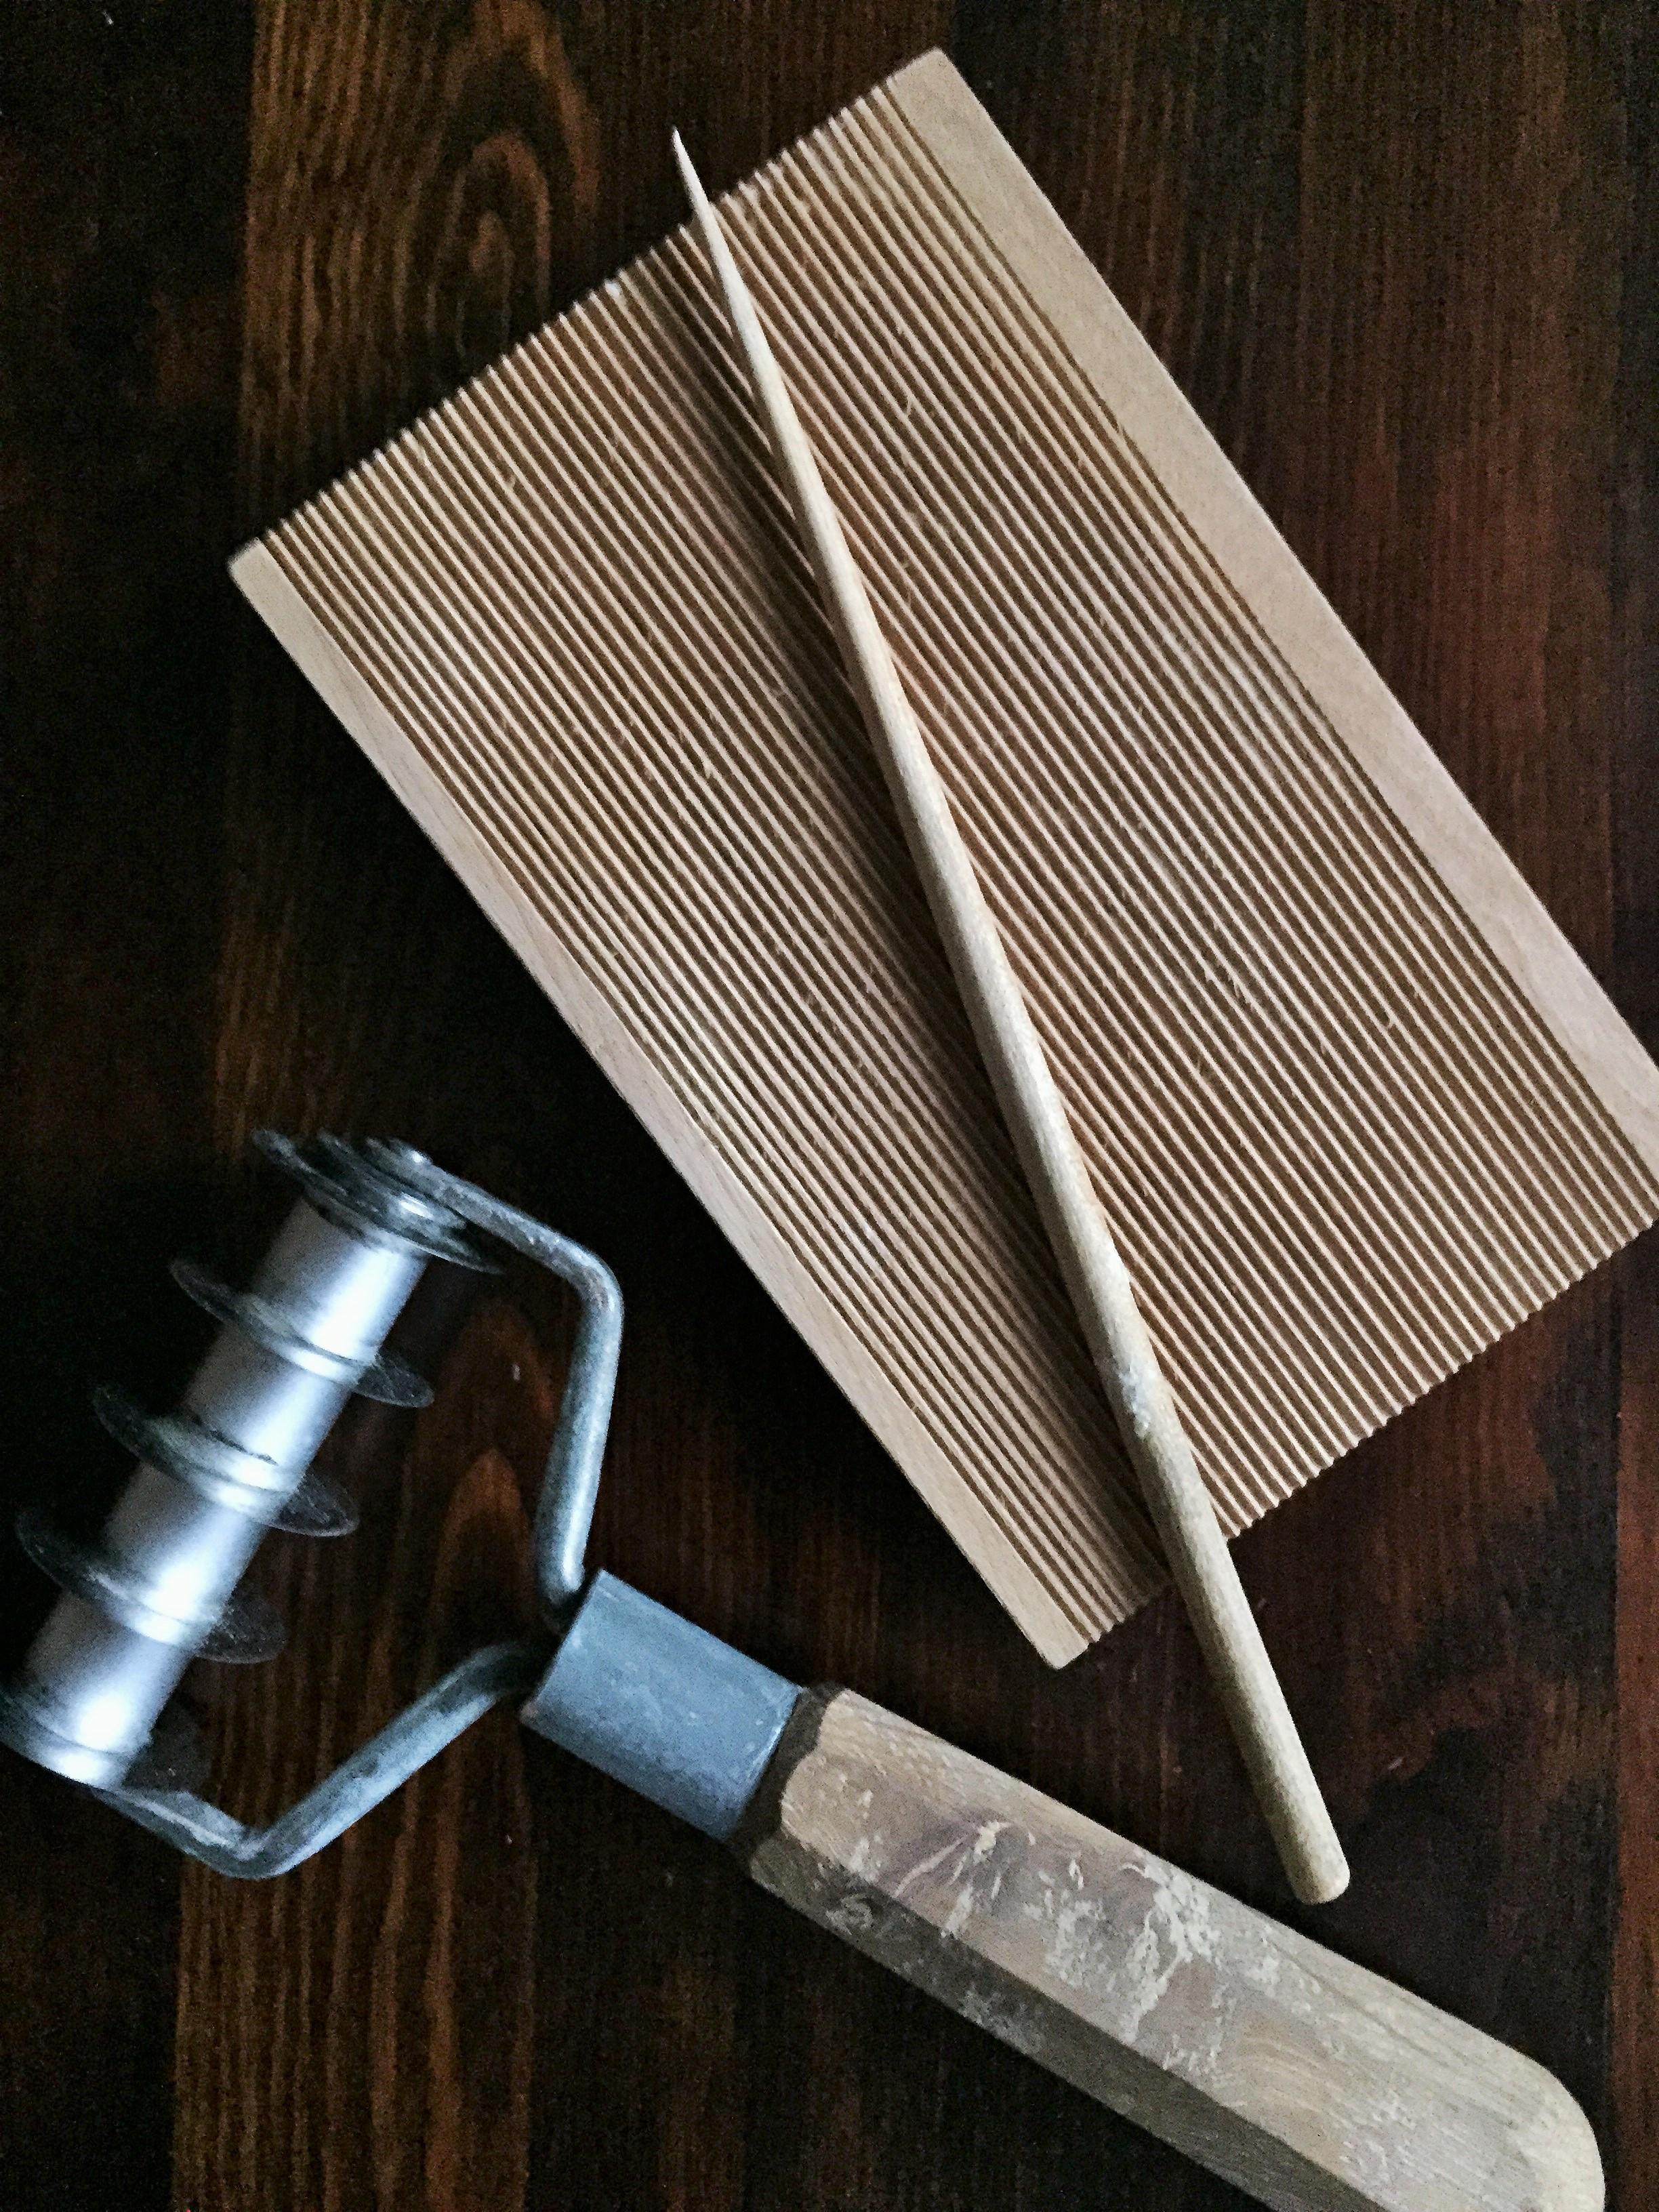 Home-made tools